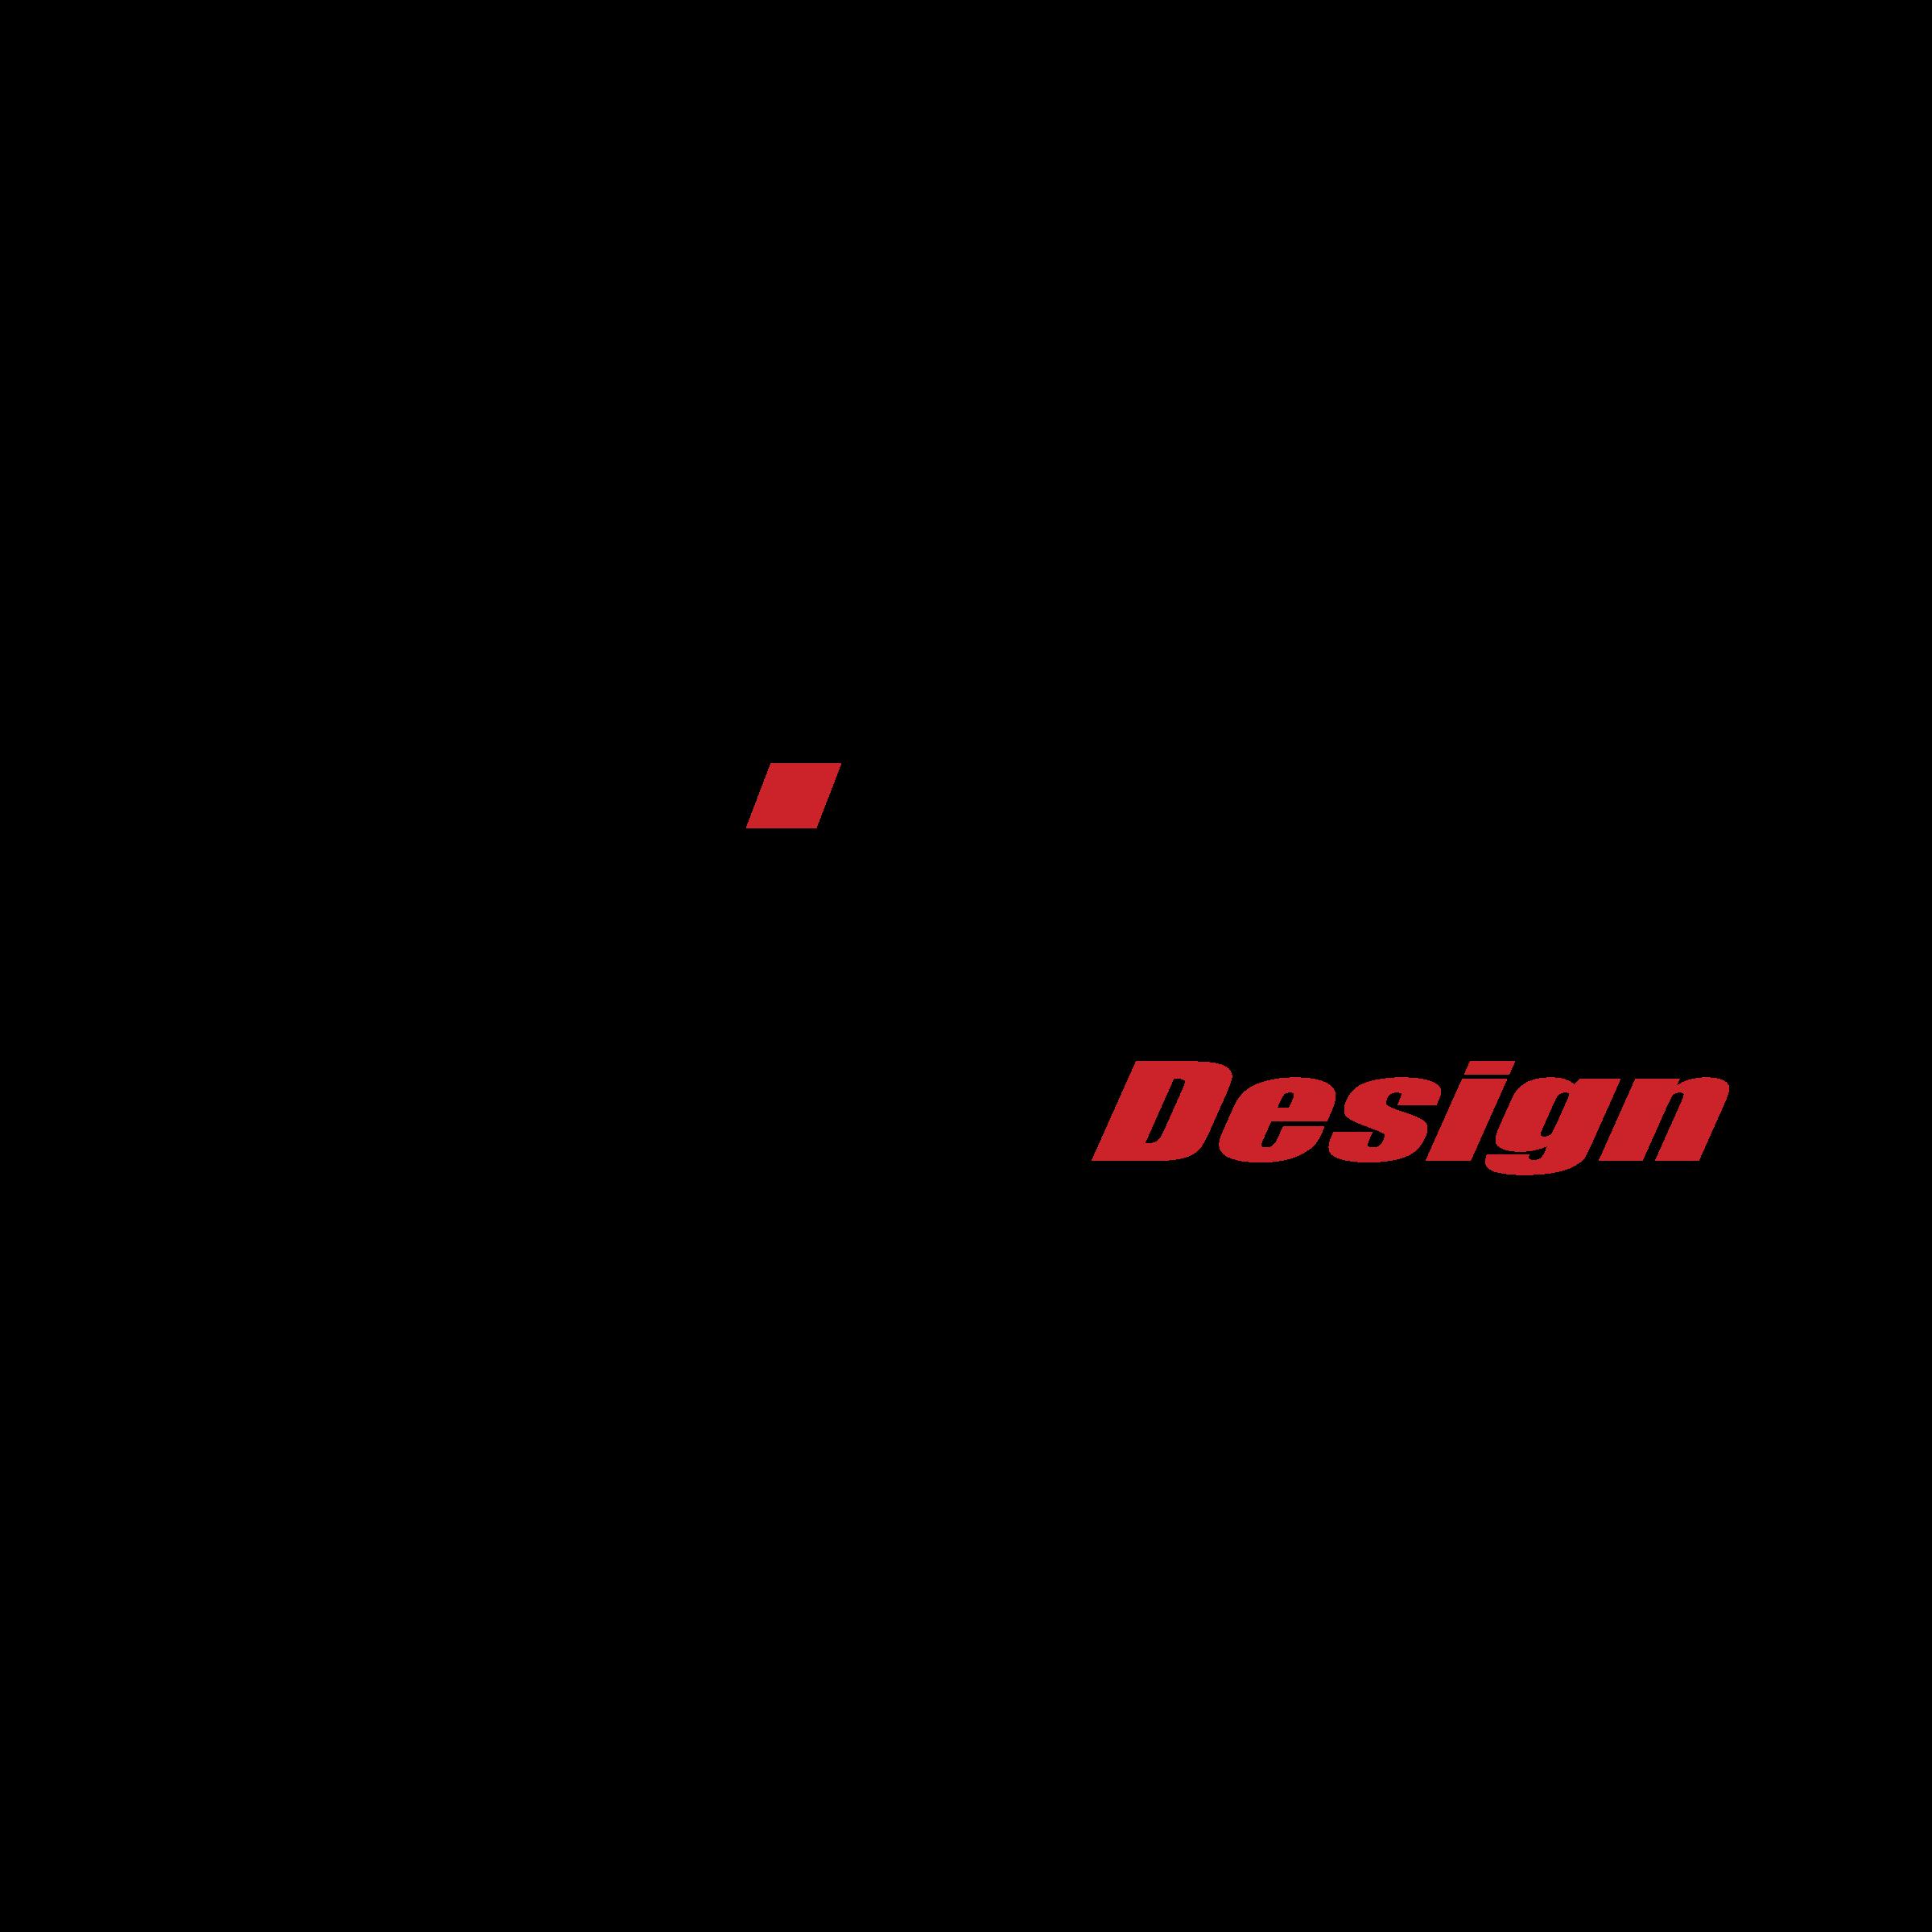 tag design racing logo png transparent svg vector freebie supply